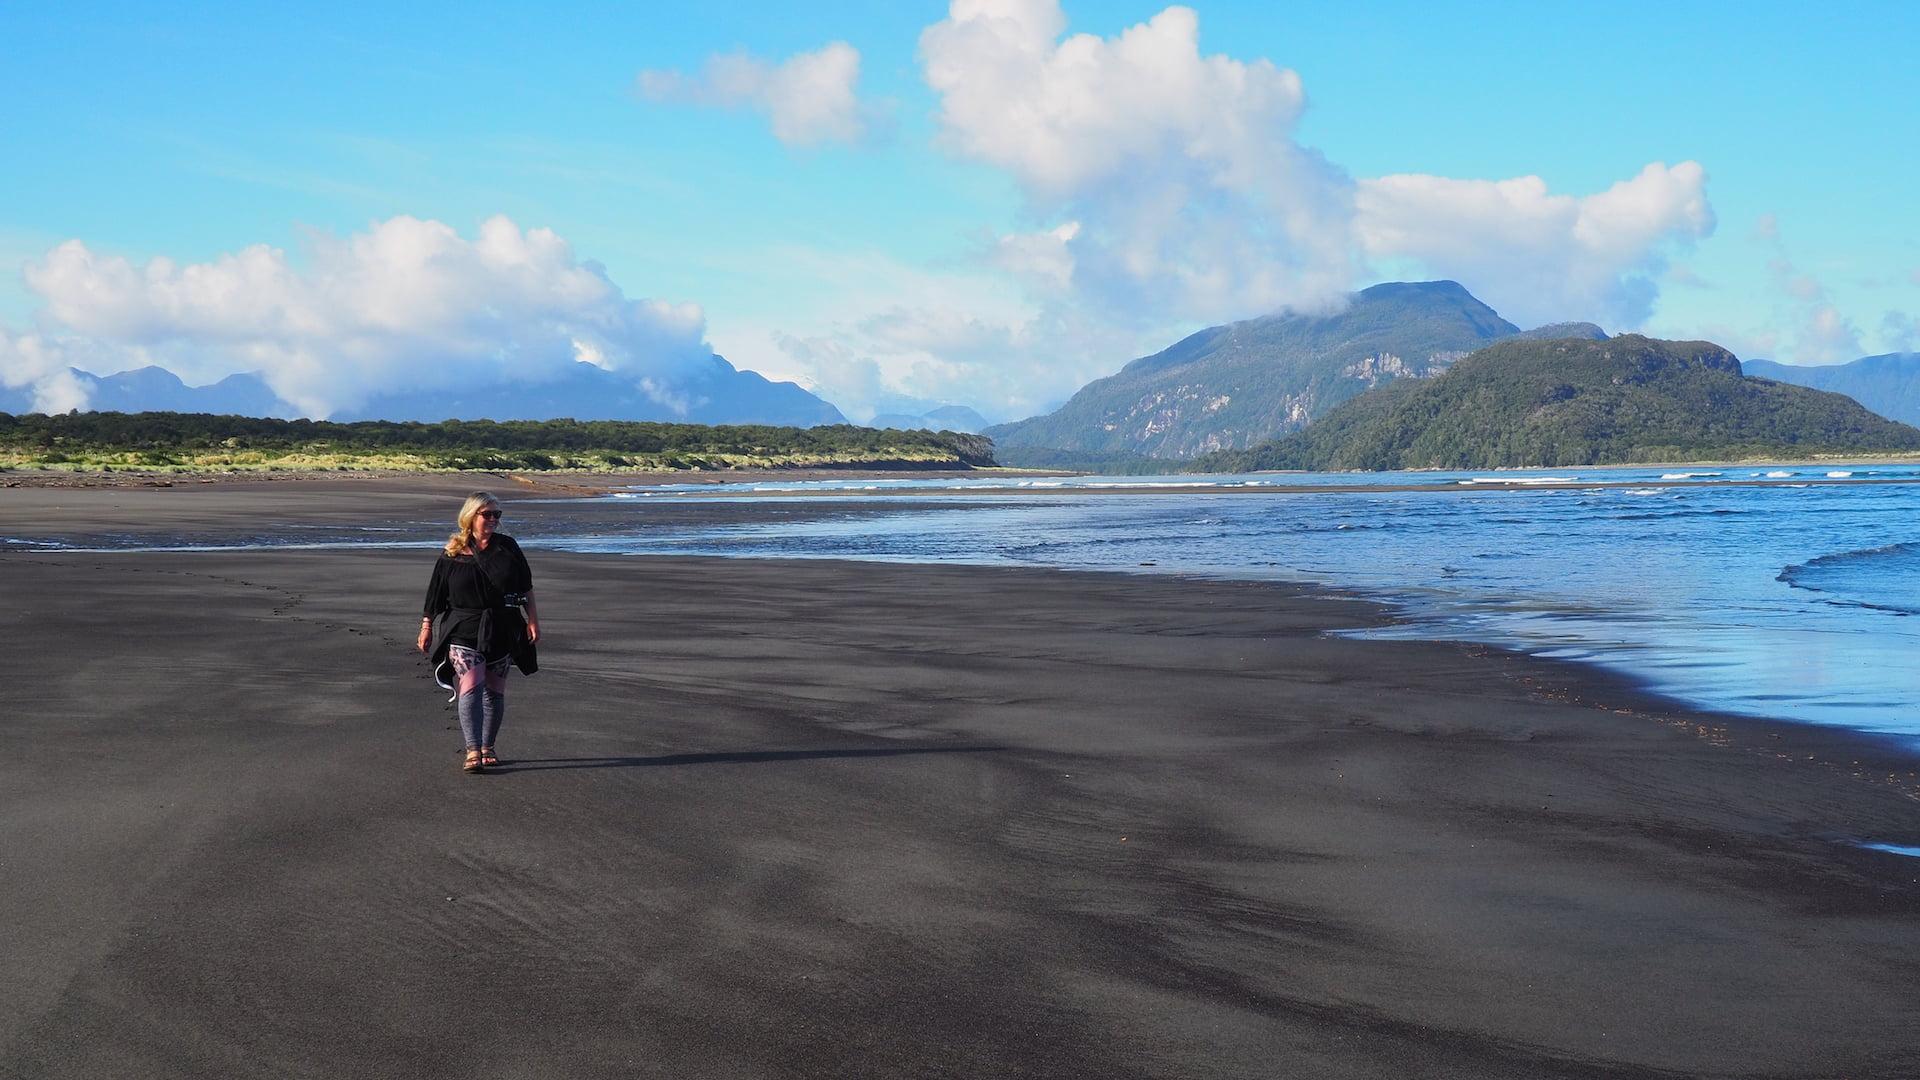 Nicky walking ocean side of the beach